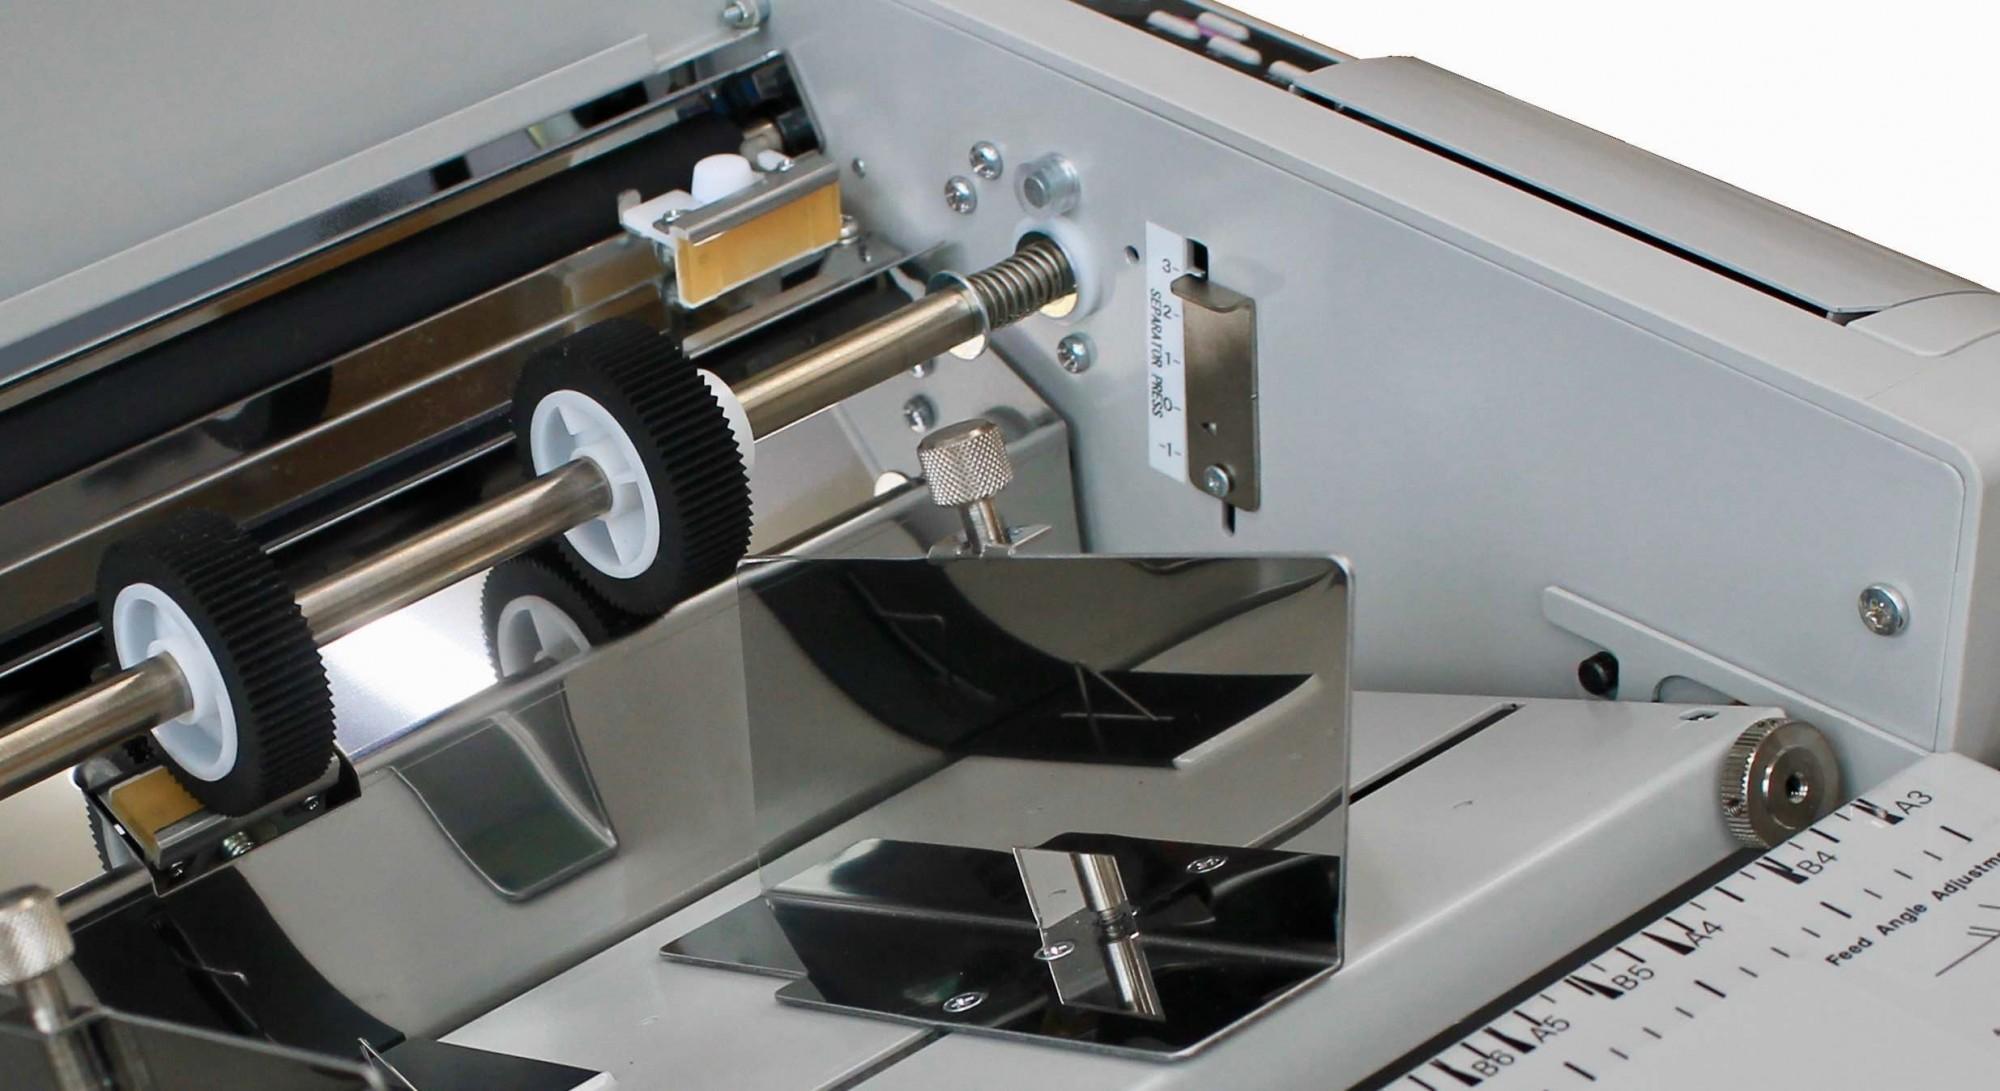 Paper Folding Machine SUPERFAX PF-440 - SUPERFAX Europe